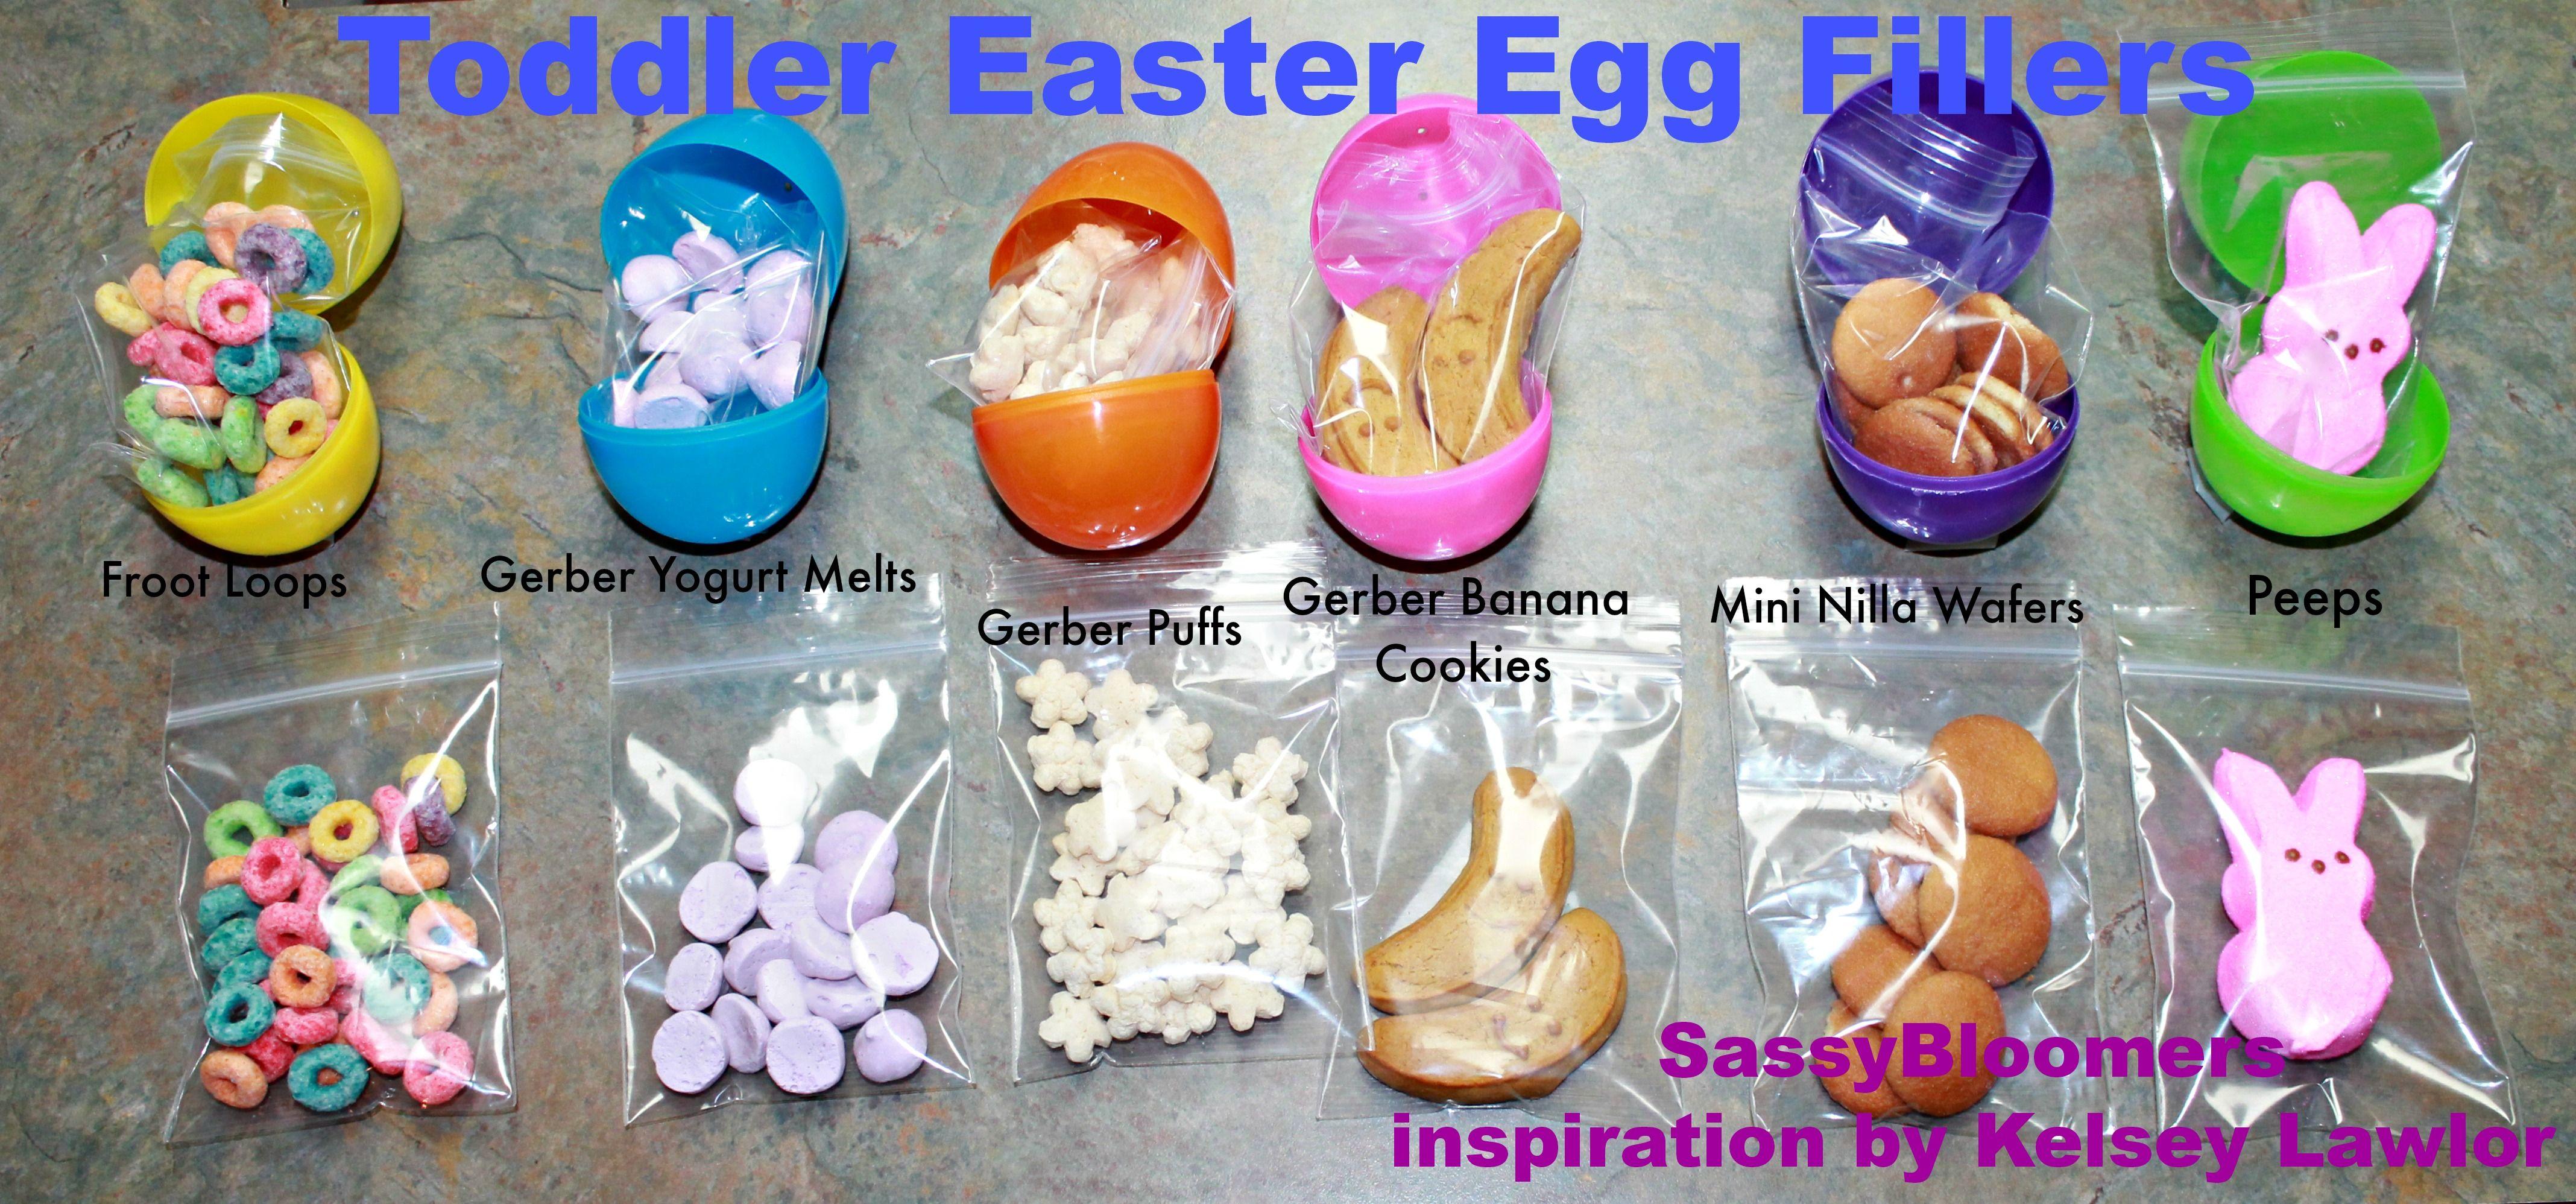 Toddler Easter Eggs Toddler Toddler Egg Fillers Easter Toddler Easter Ideas